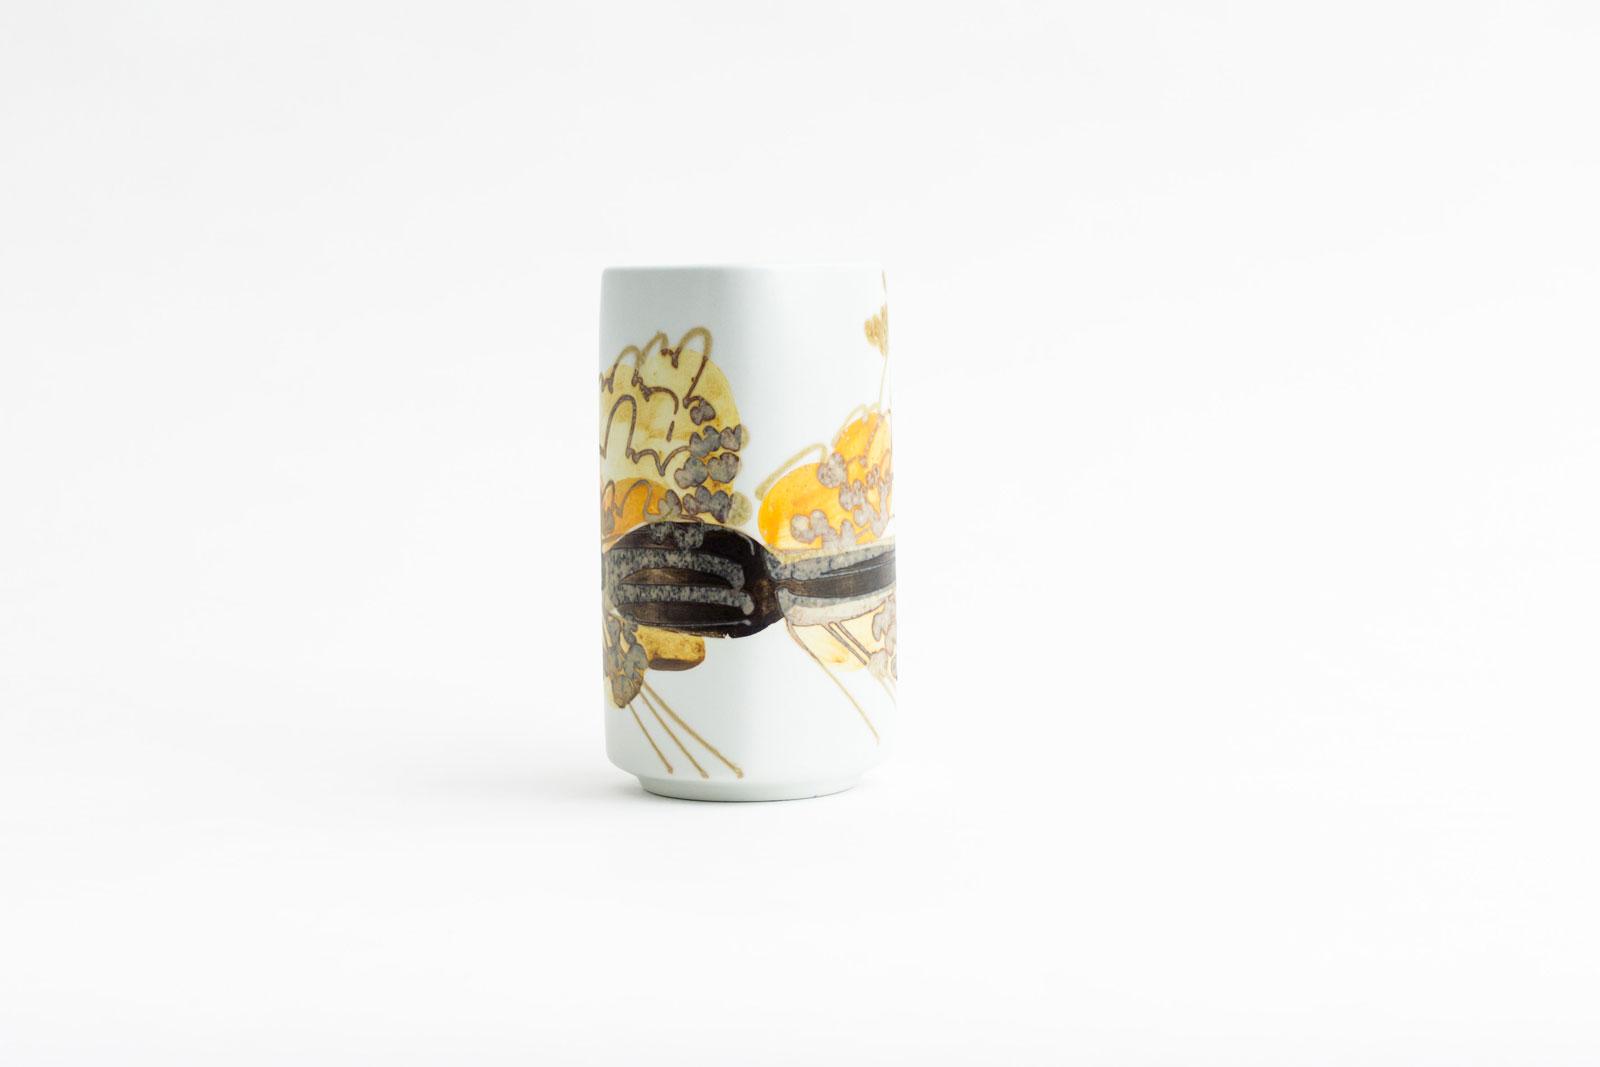 Vase designed by Ellen Malmar